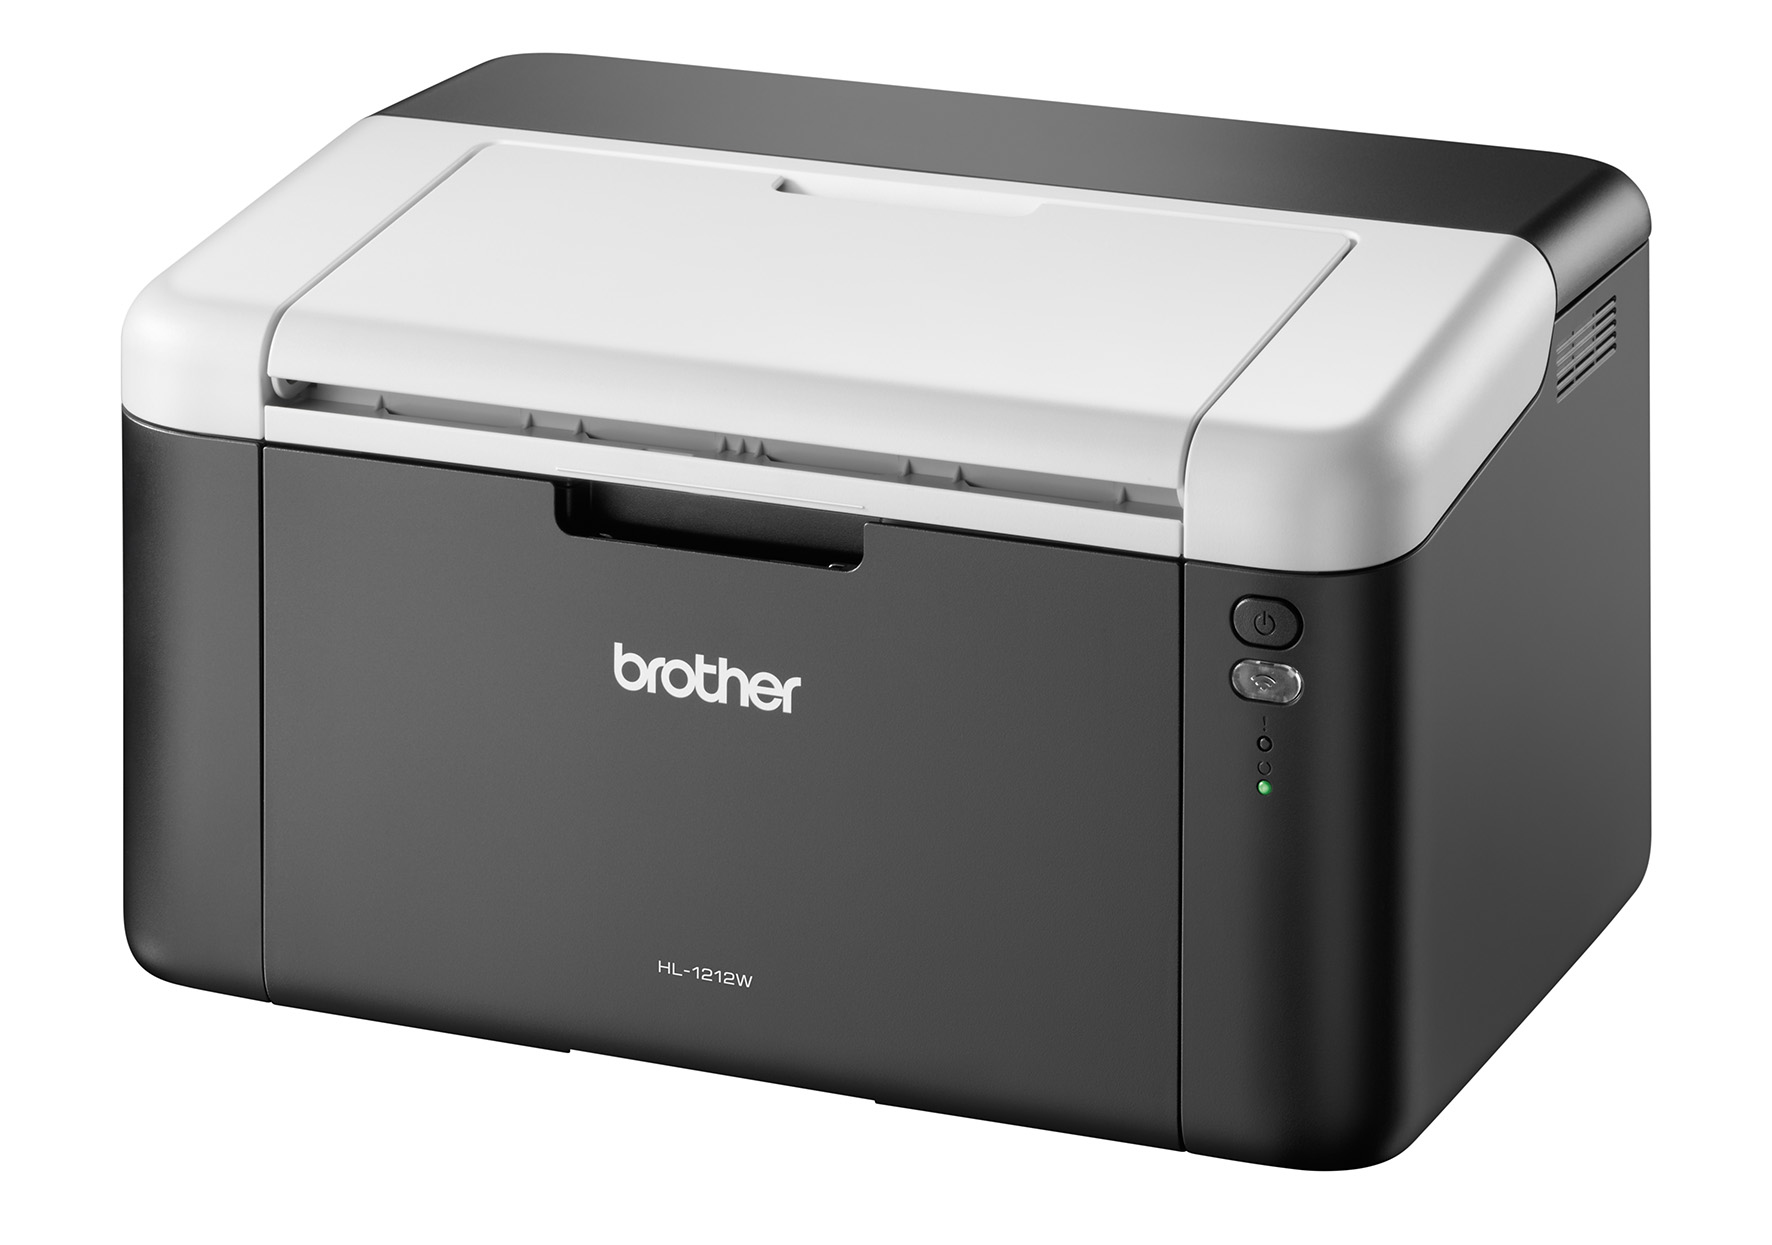 BROTHER HL-1212W A4 monochrom Laserdrucker 20ppm 2400x600pi 150 Blatt Papierzufuhr WLAN